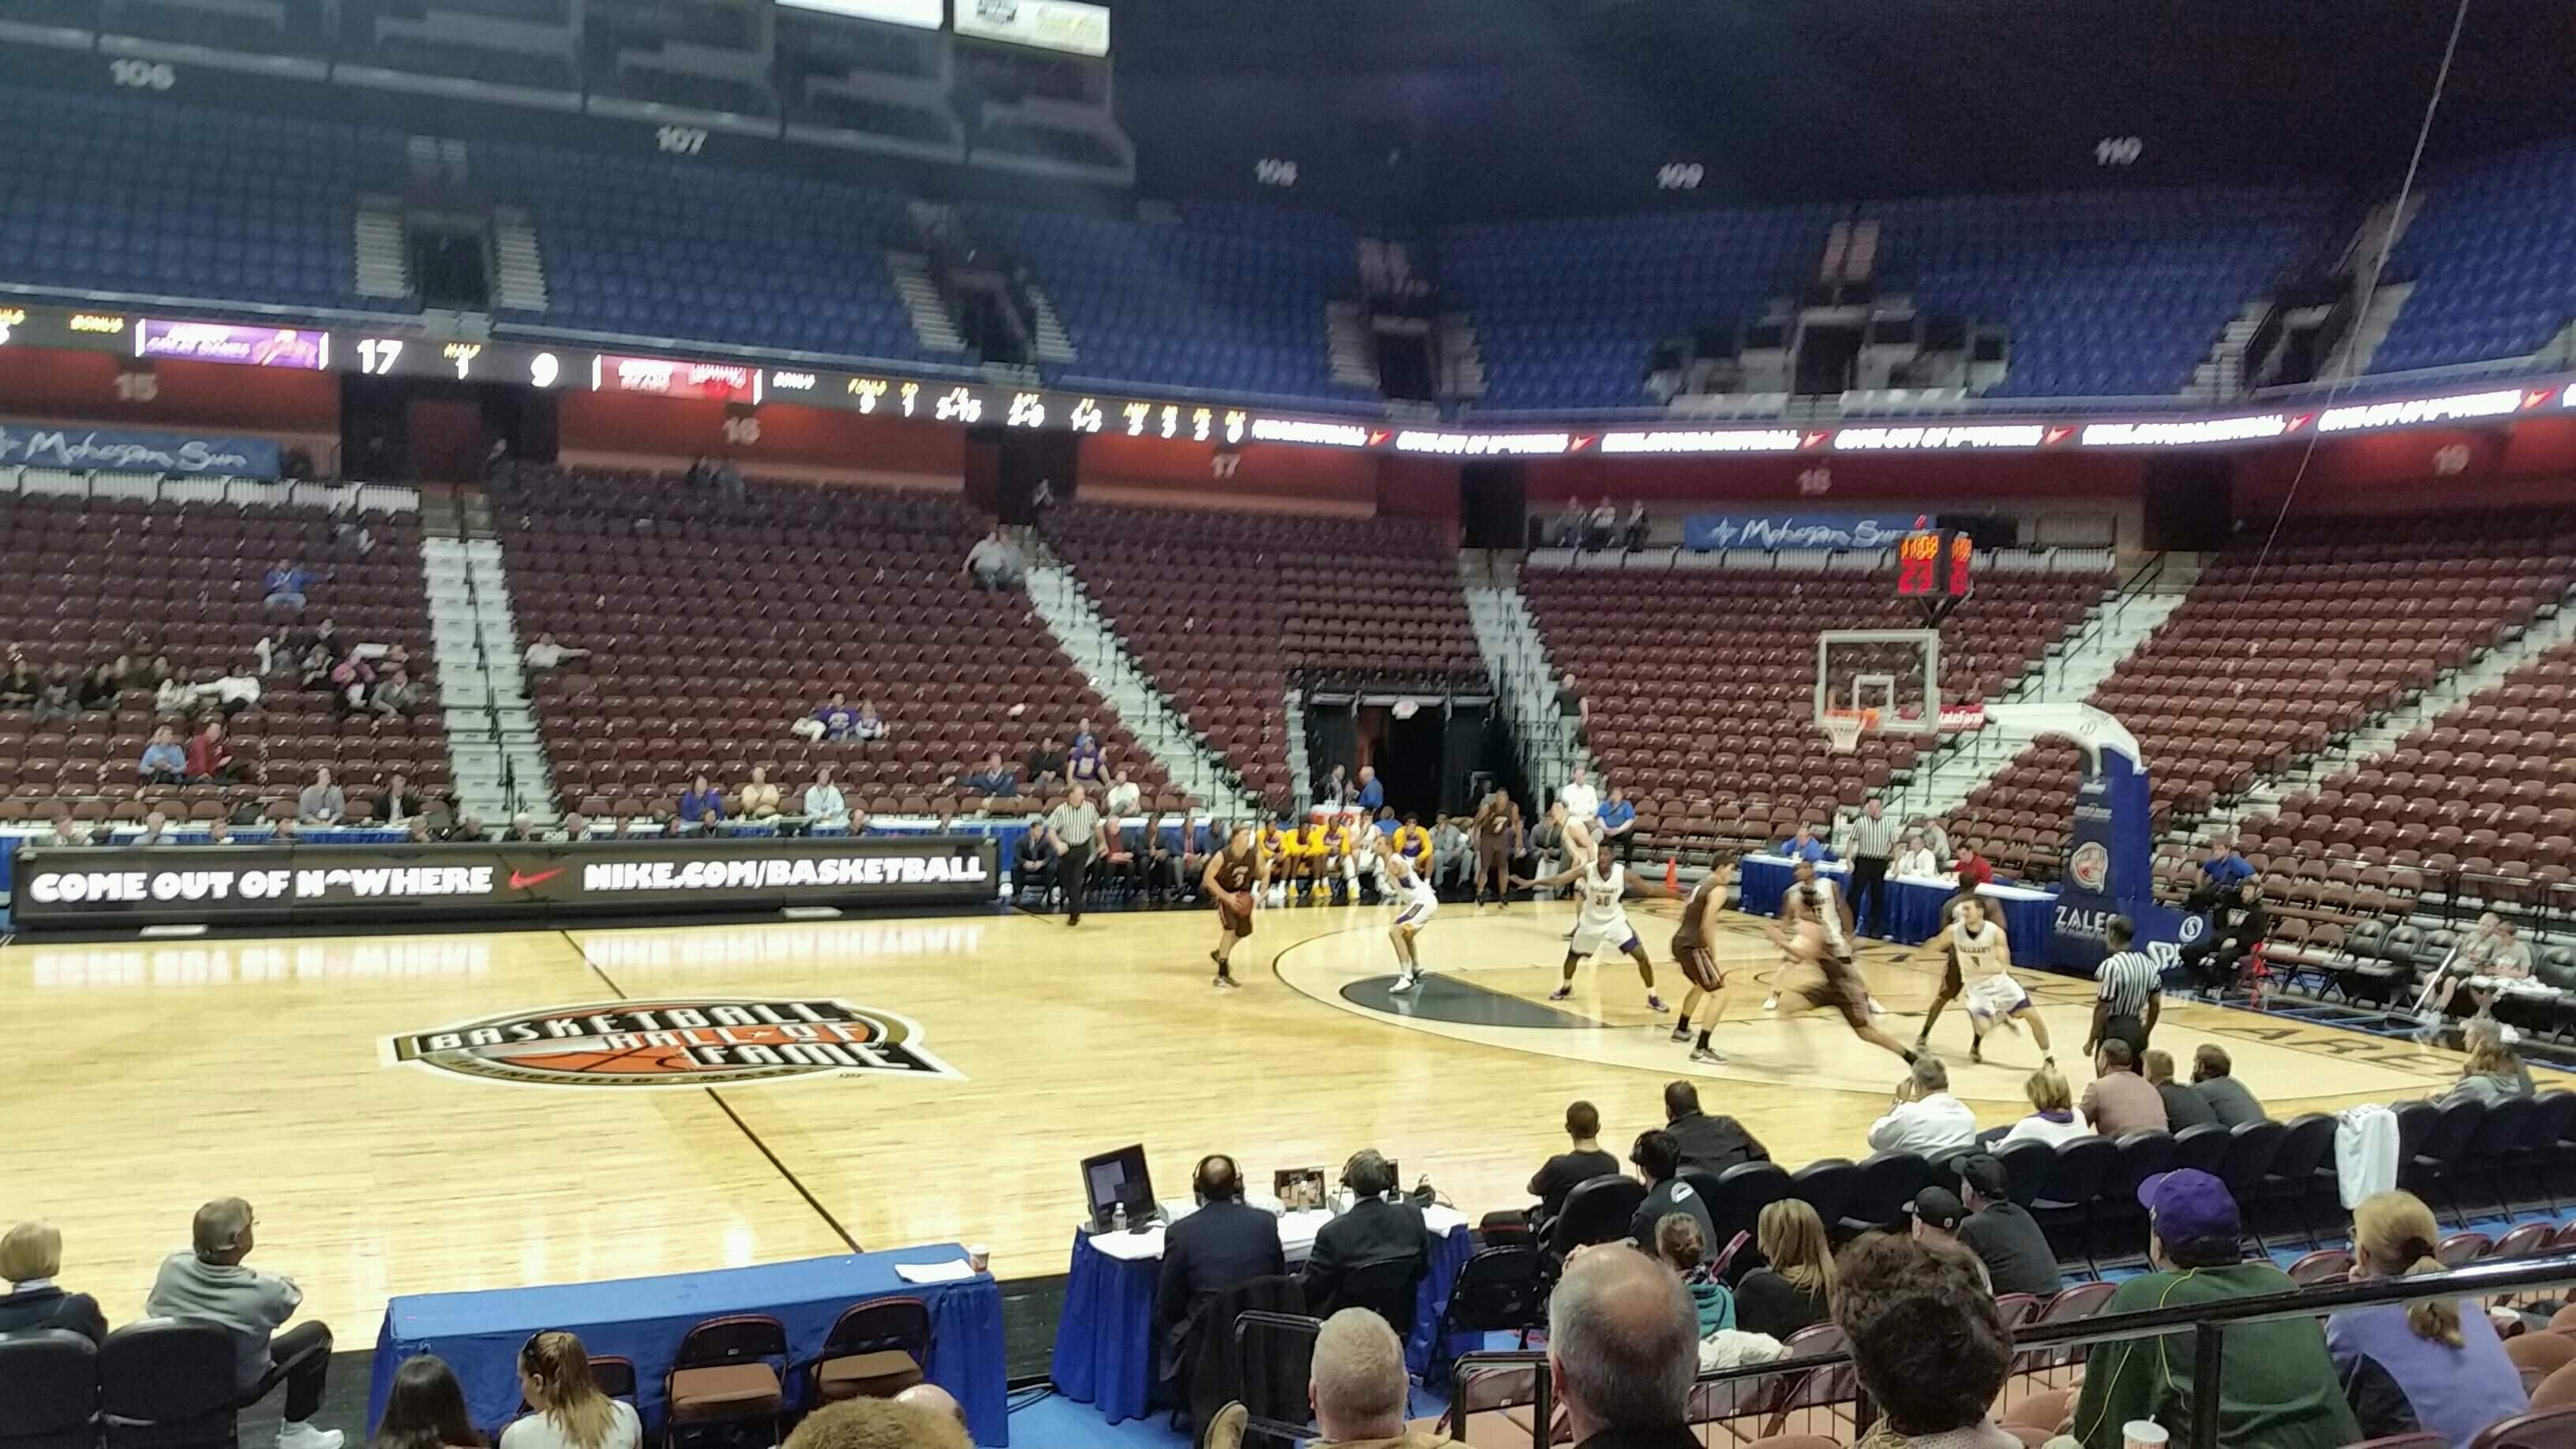 Mohegan Sun Arena Section 25 Row I Seat 5